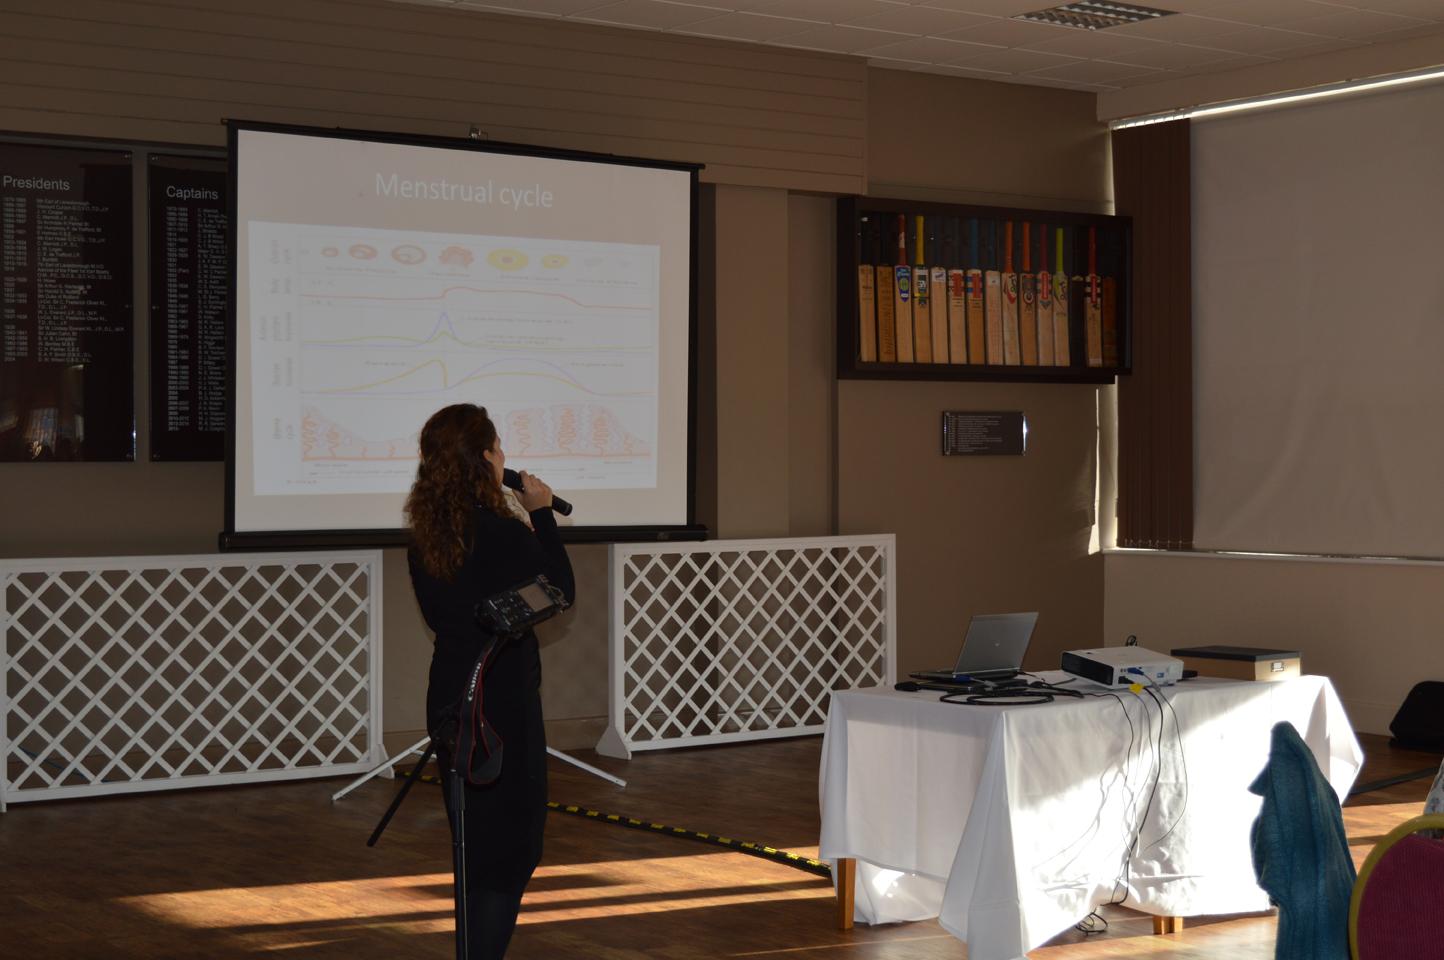 Dr Abtehale Al-Hussaini updates delegates on the research